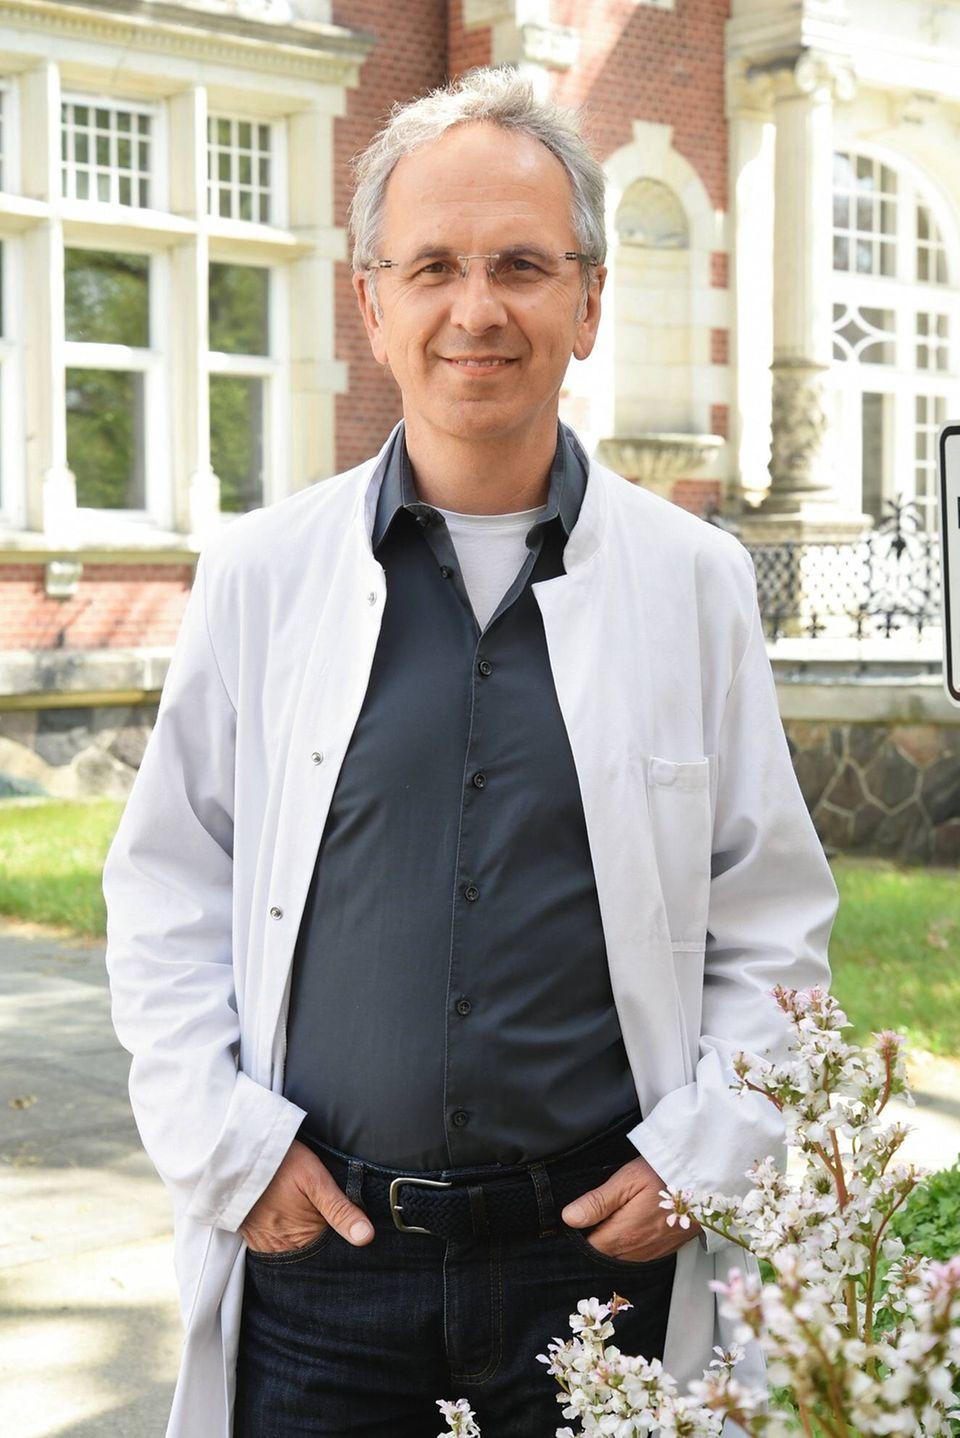 Andreas Michalsen: Prof. Dr. Andreas Michalsen